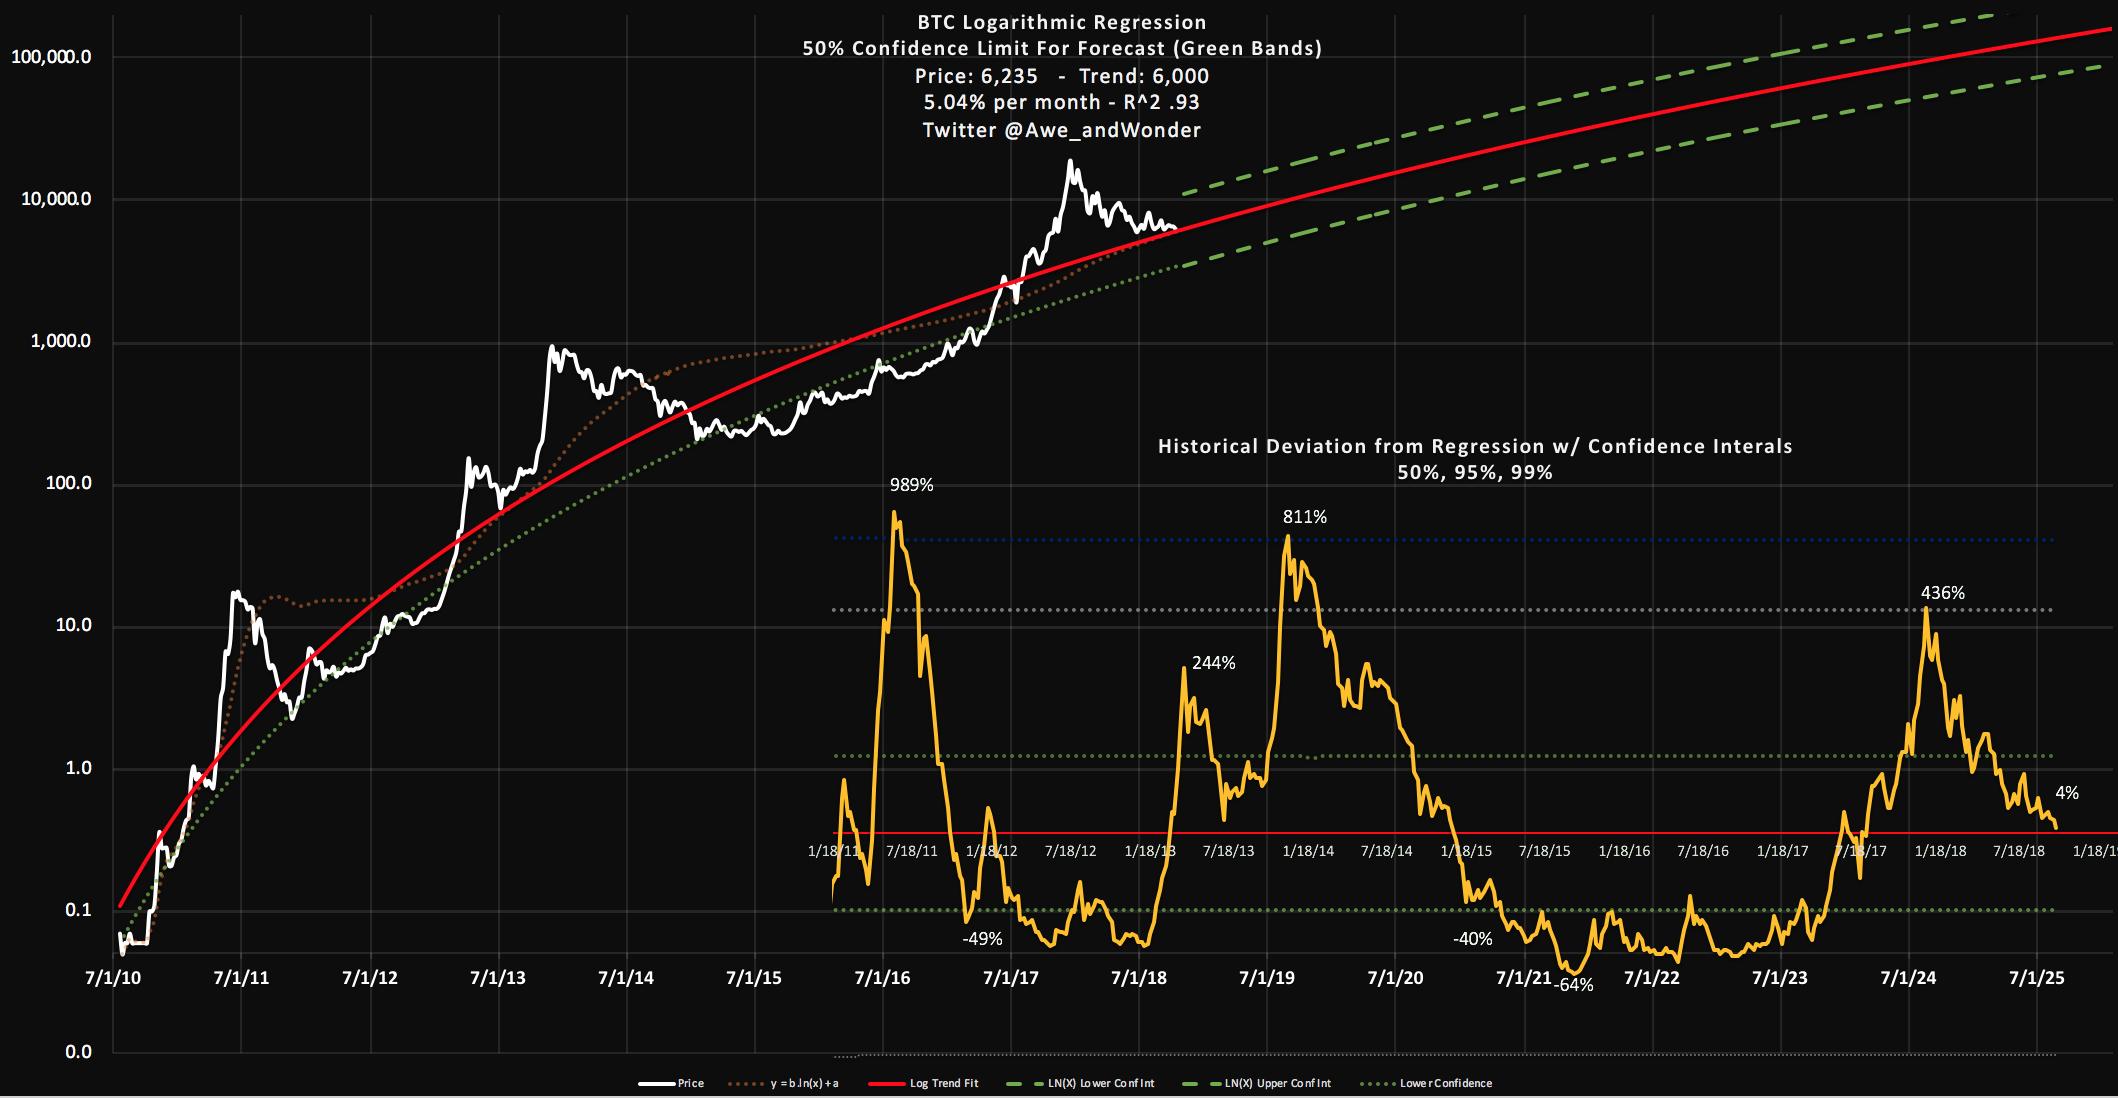 Price Regression